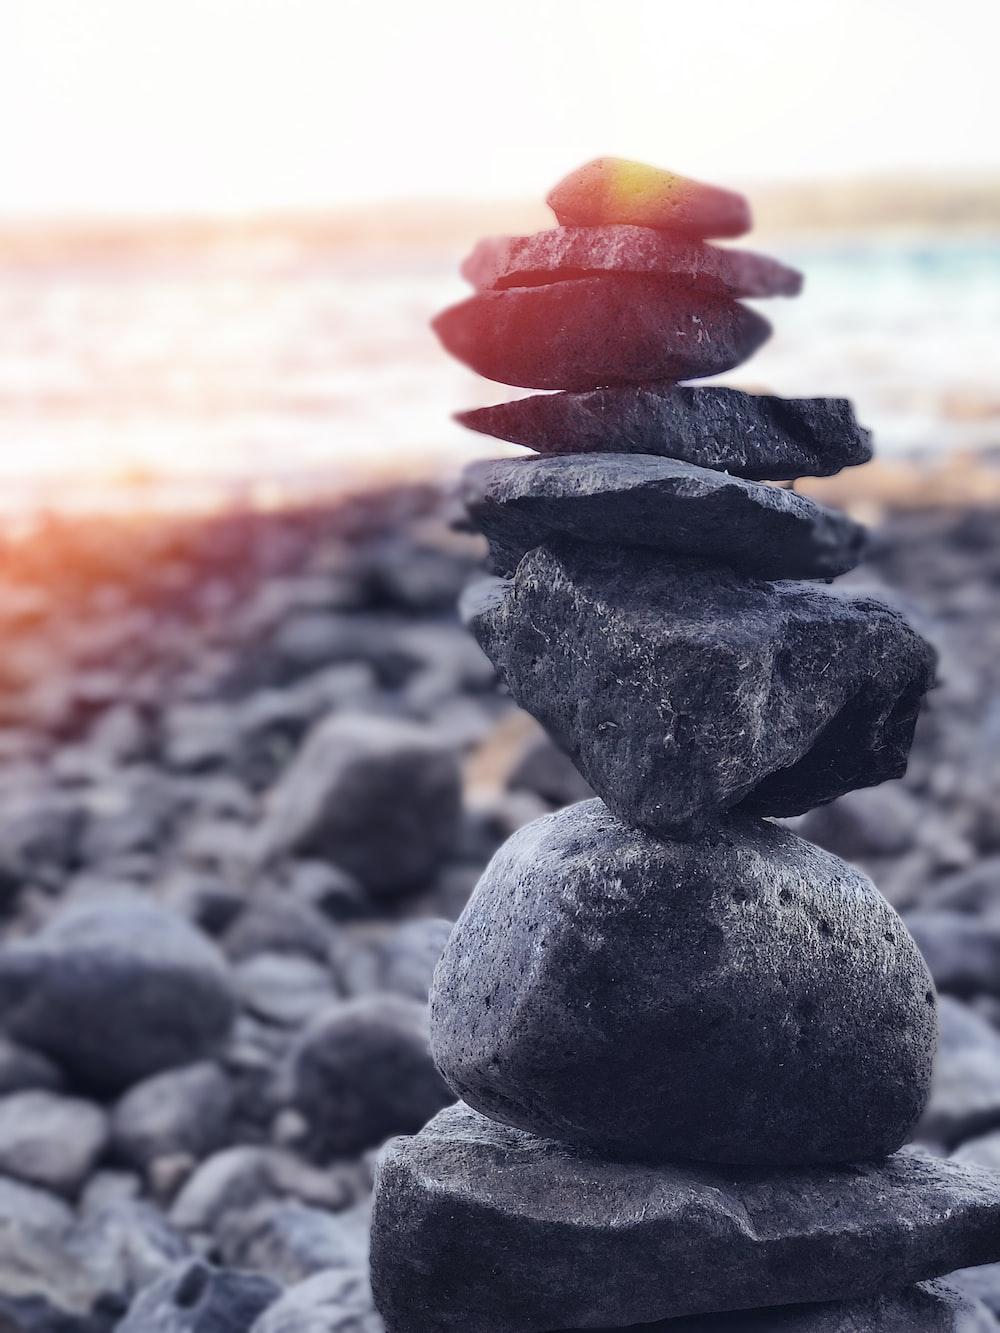 stack of stones near seashore at daytime